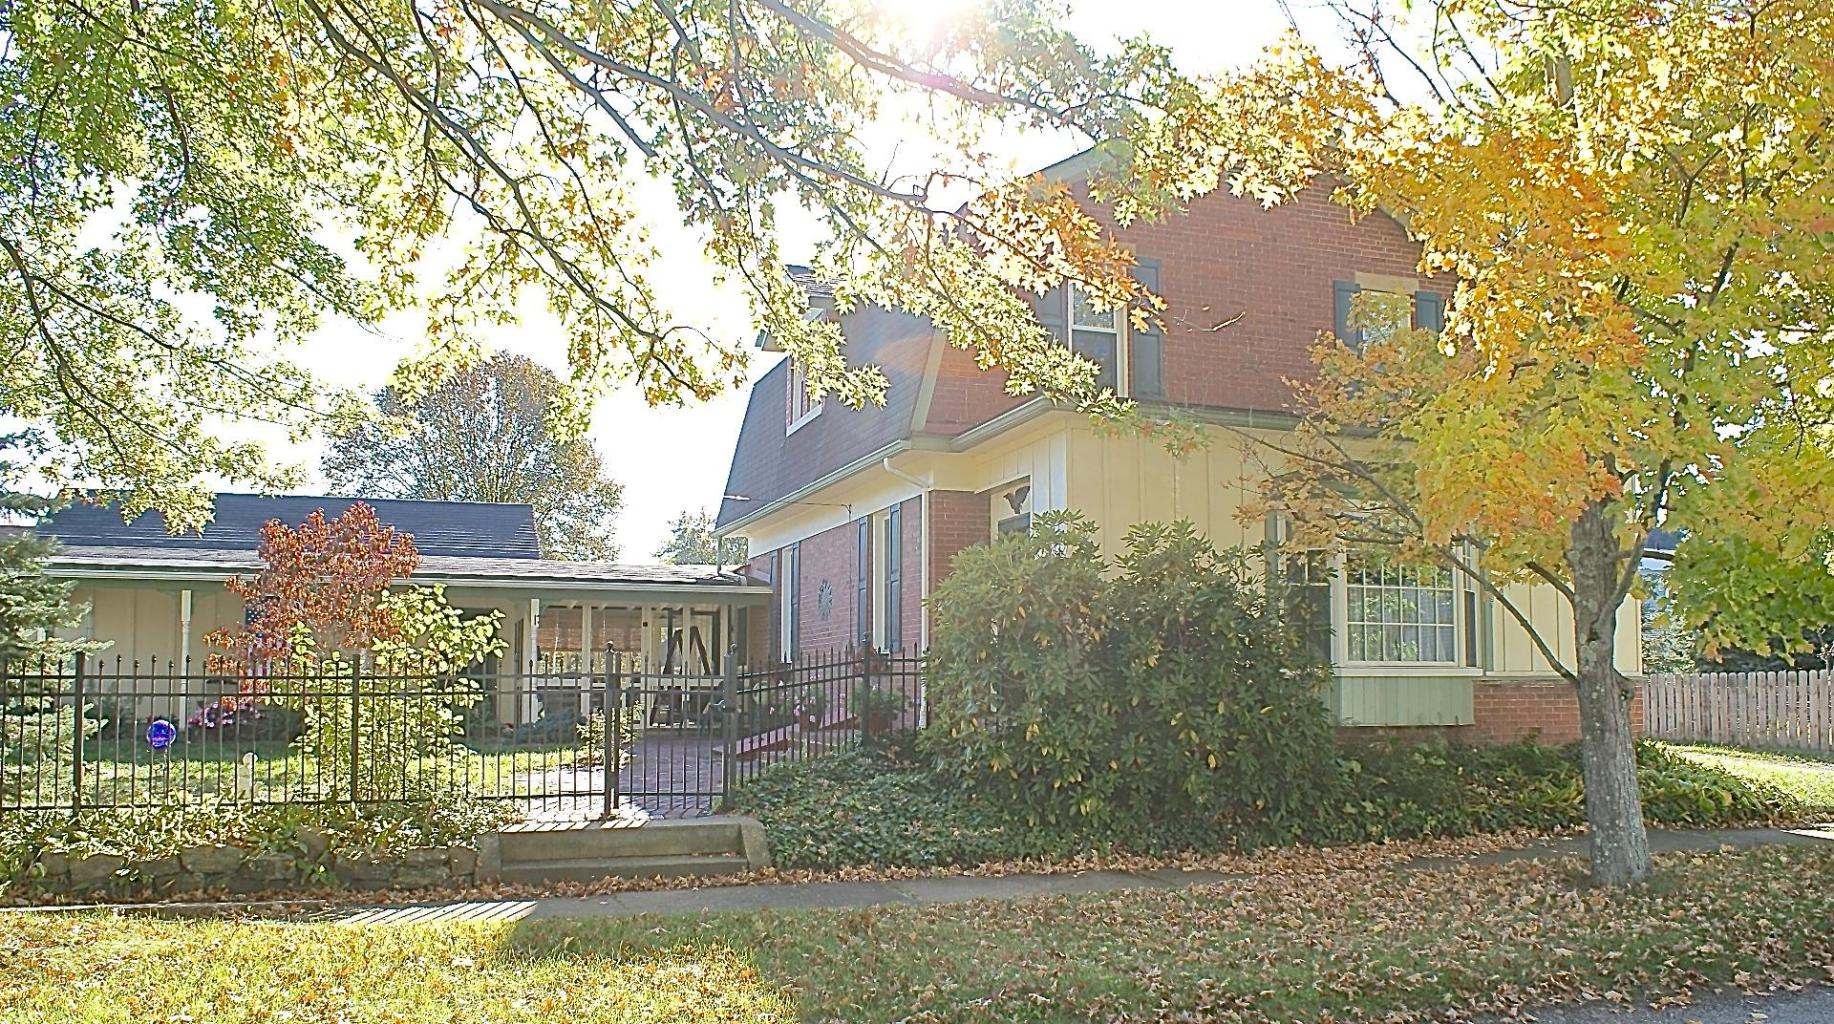 108 The Boulevard, Pt. Marion, Pennsylvania 15474